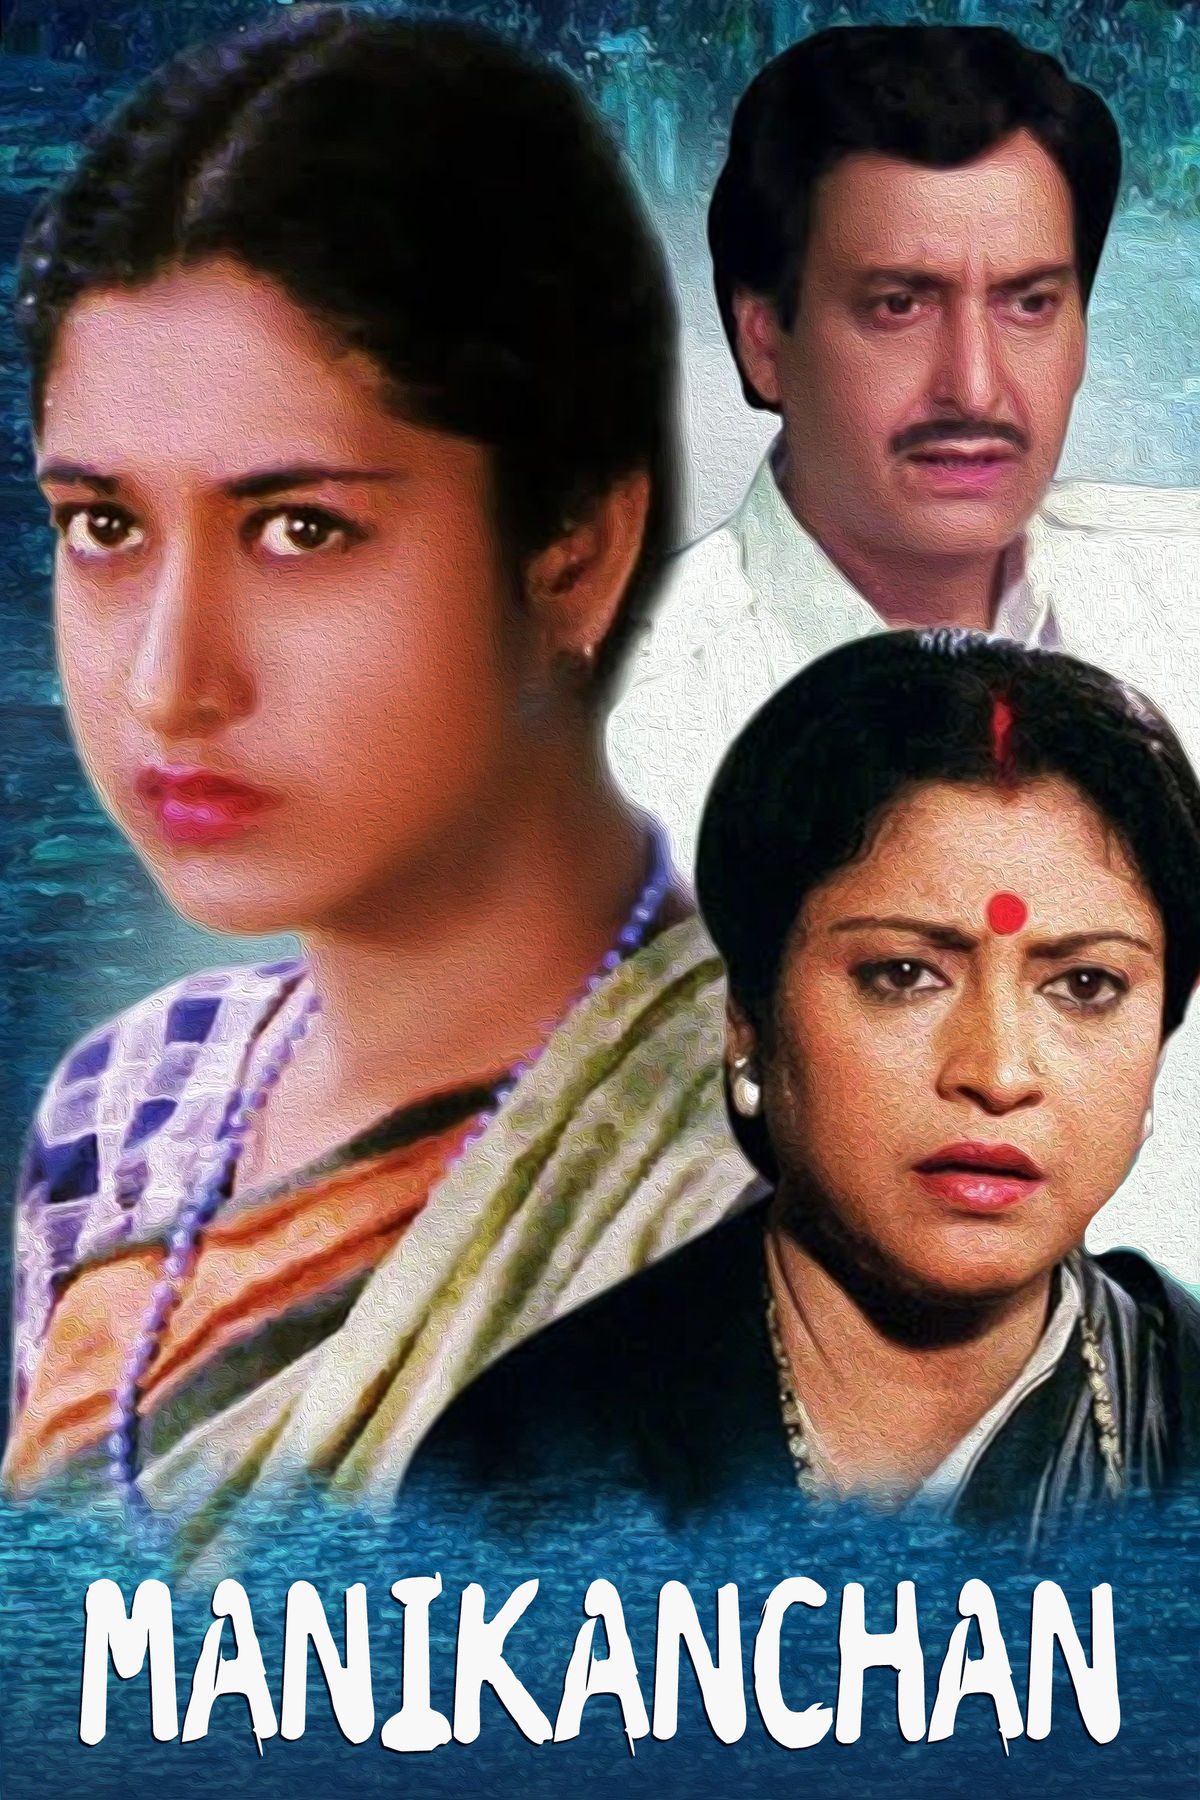 Satya Bandopadhyay Best Movies, TV Shows and Web Series List